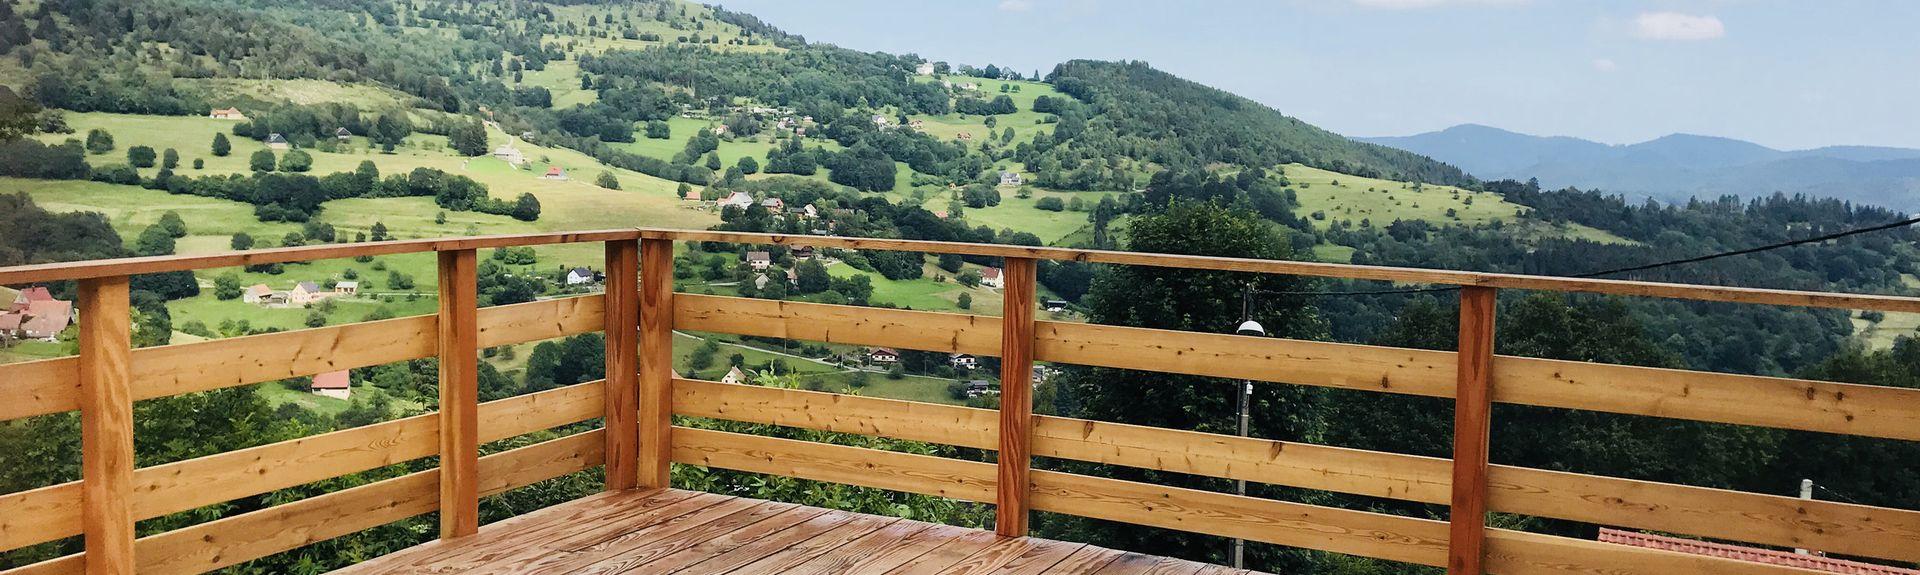 Breitenbach-Haut-Rhin, Alsace-Champagne-Ardenne-Lorraine, France